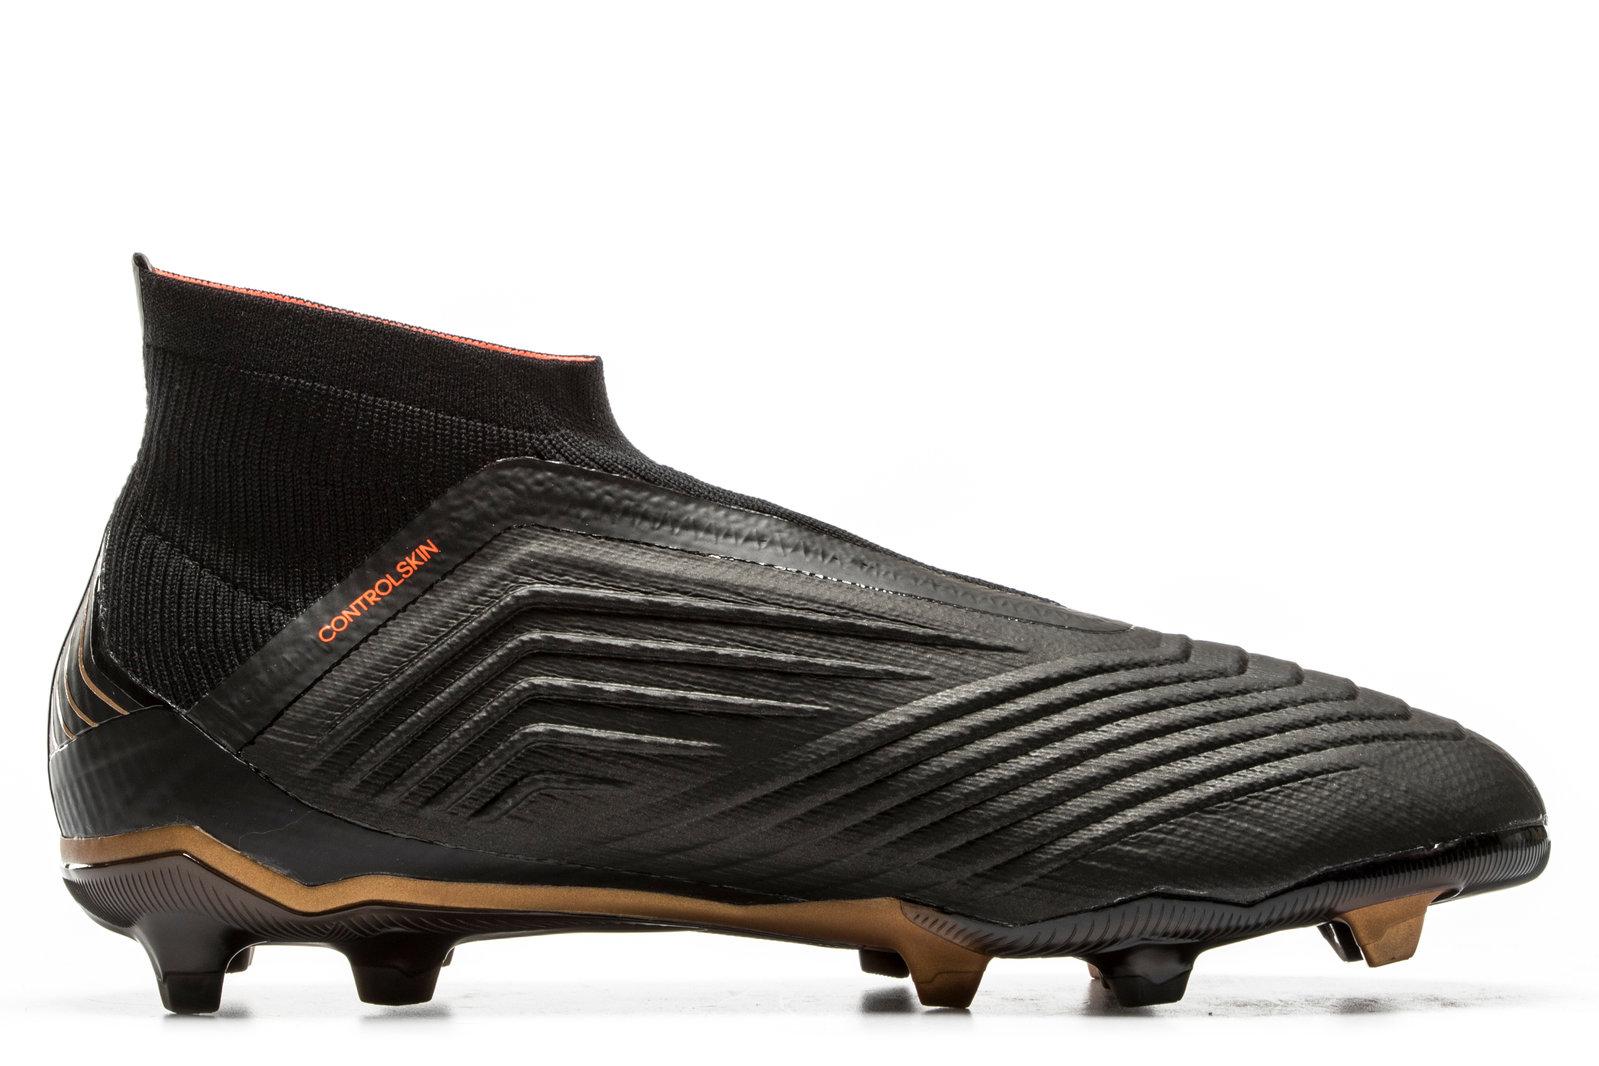 531727b45 adidas Predator 18+ Kids FG Football Boots Sports Studs Trainers Shoes